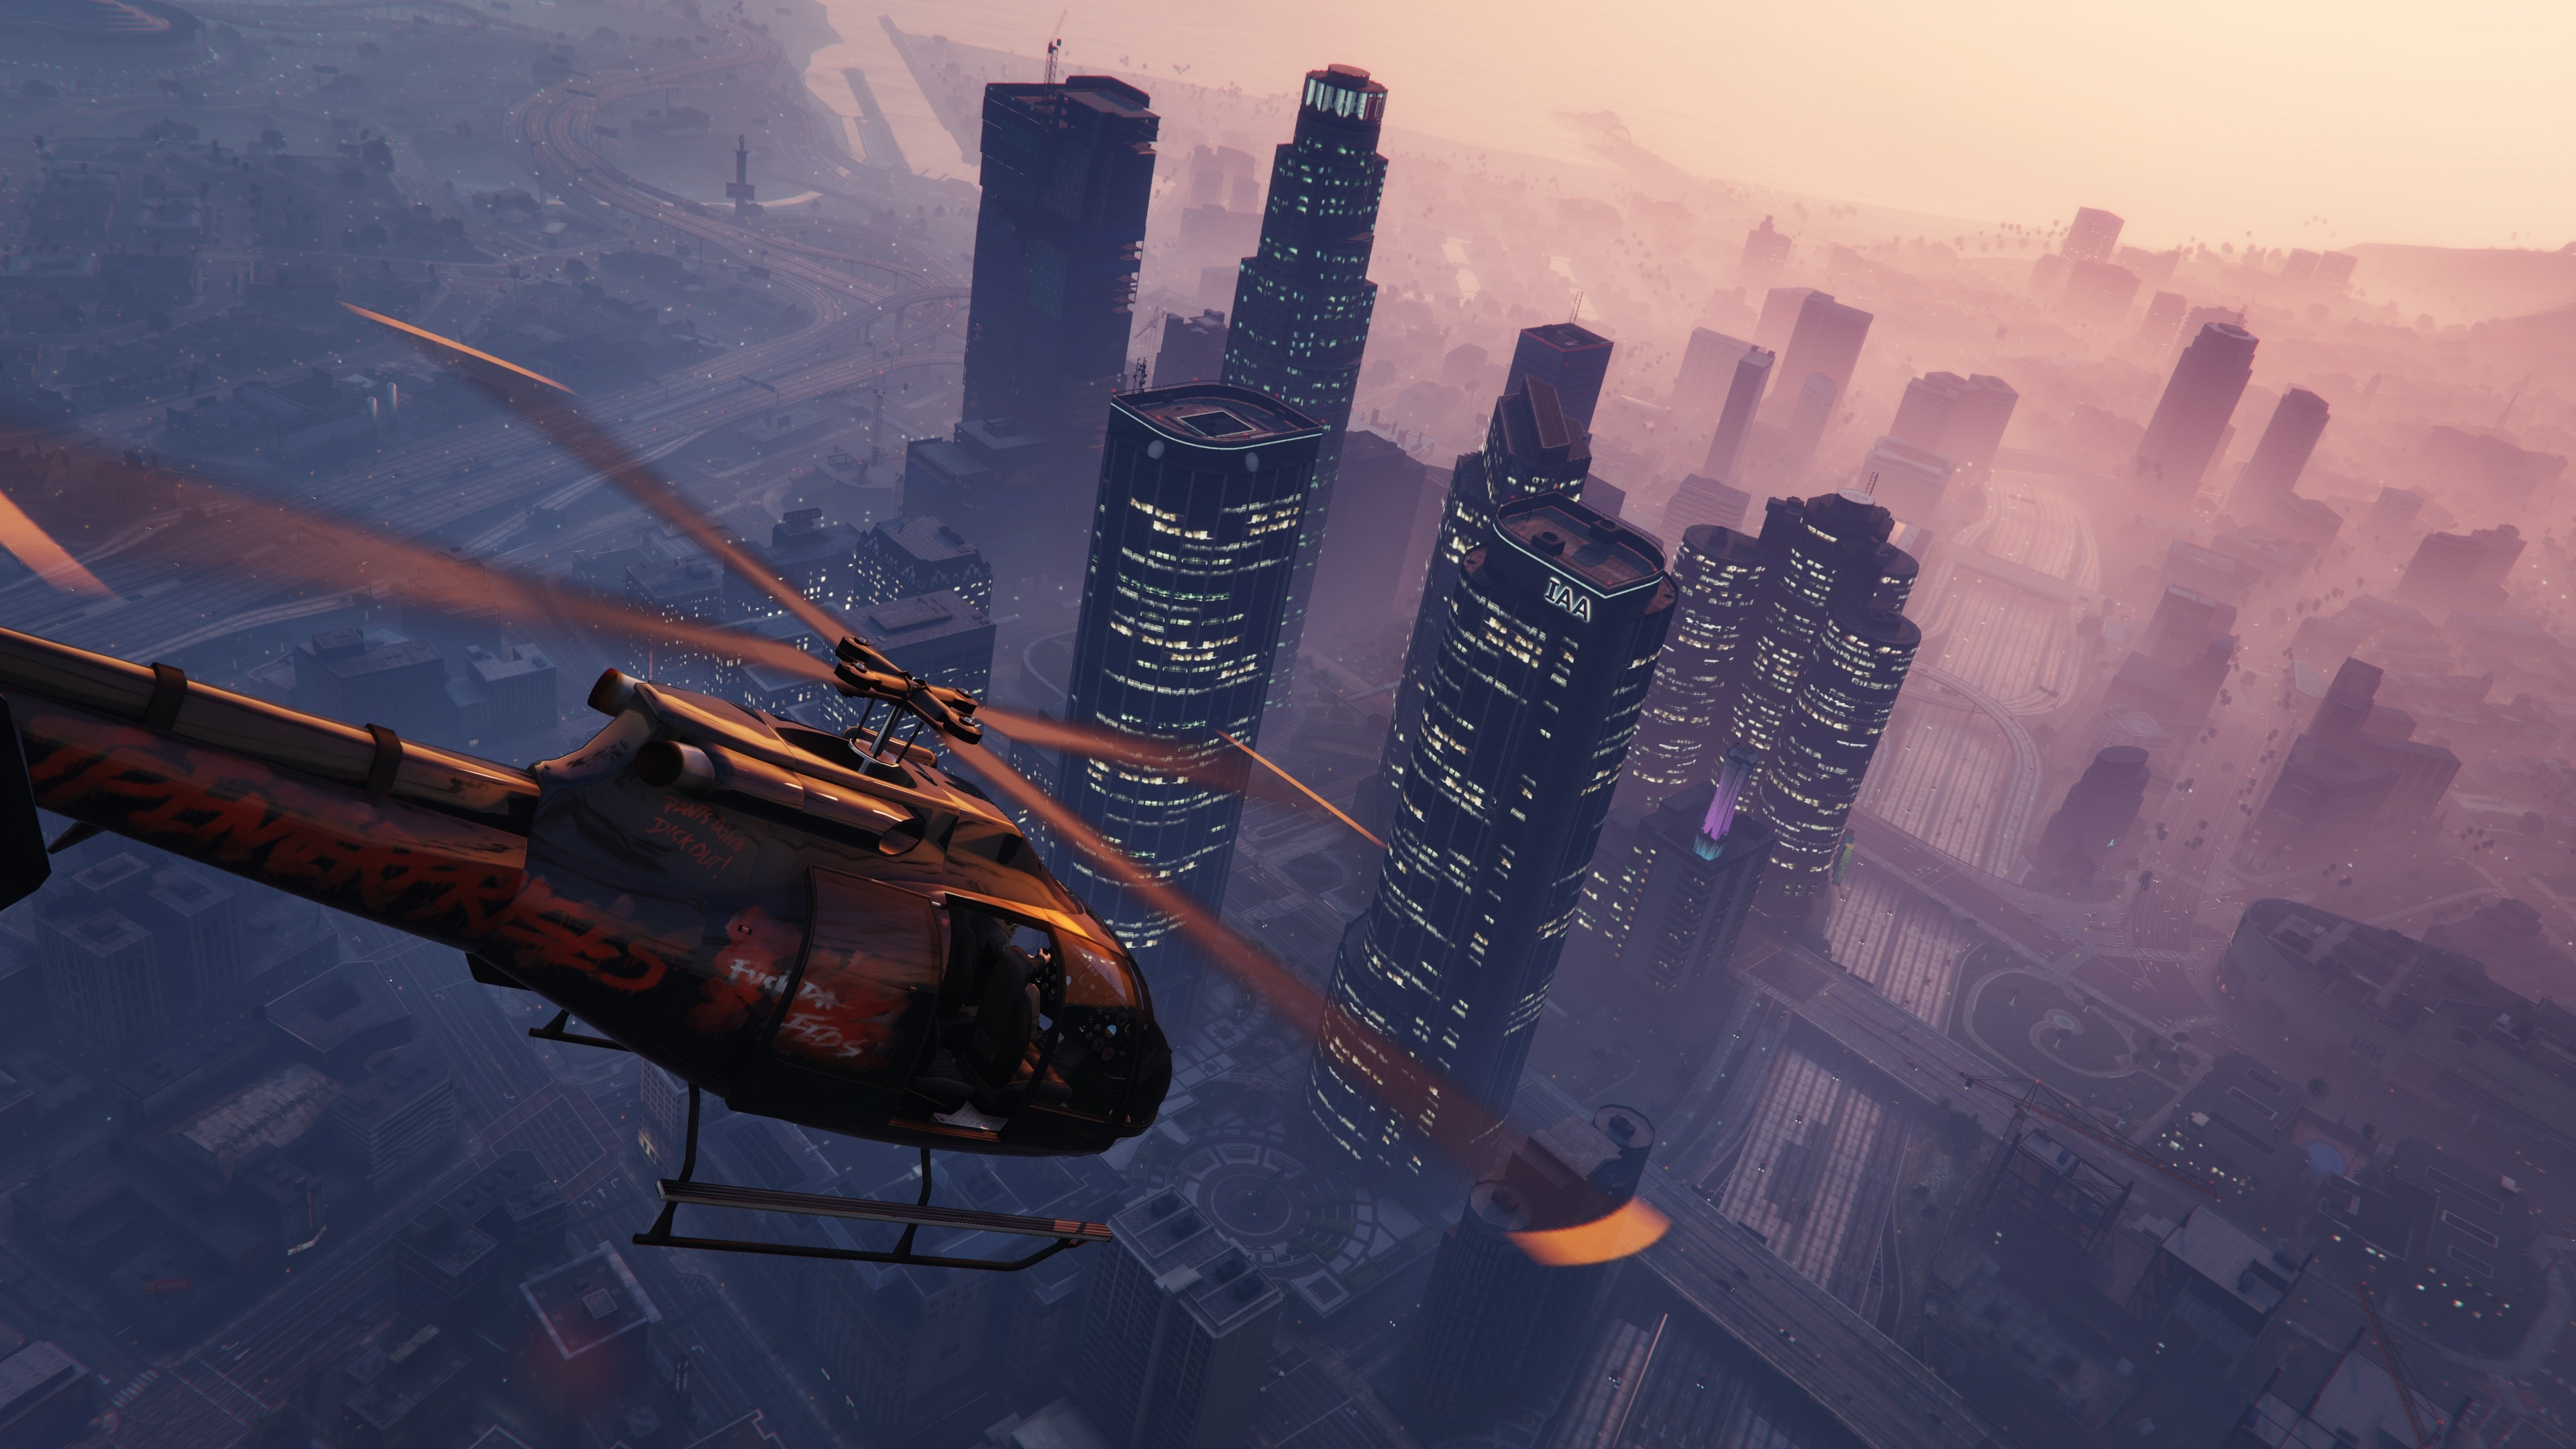 Wallpaper grand theft auto v, gta 5, helicopter, sky, building